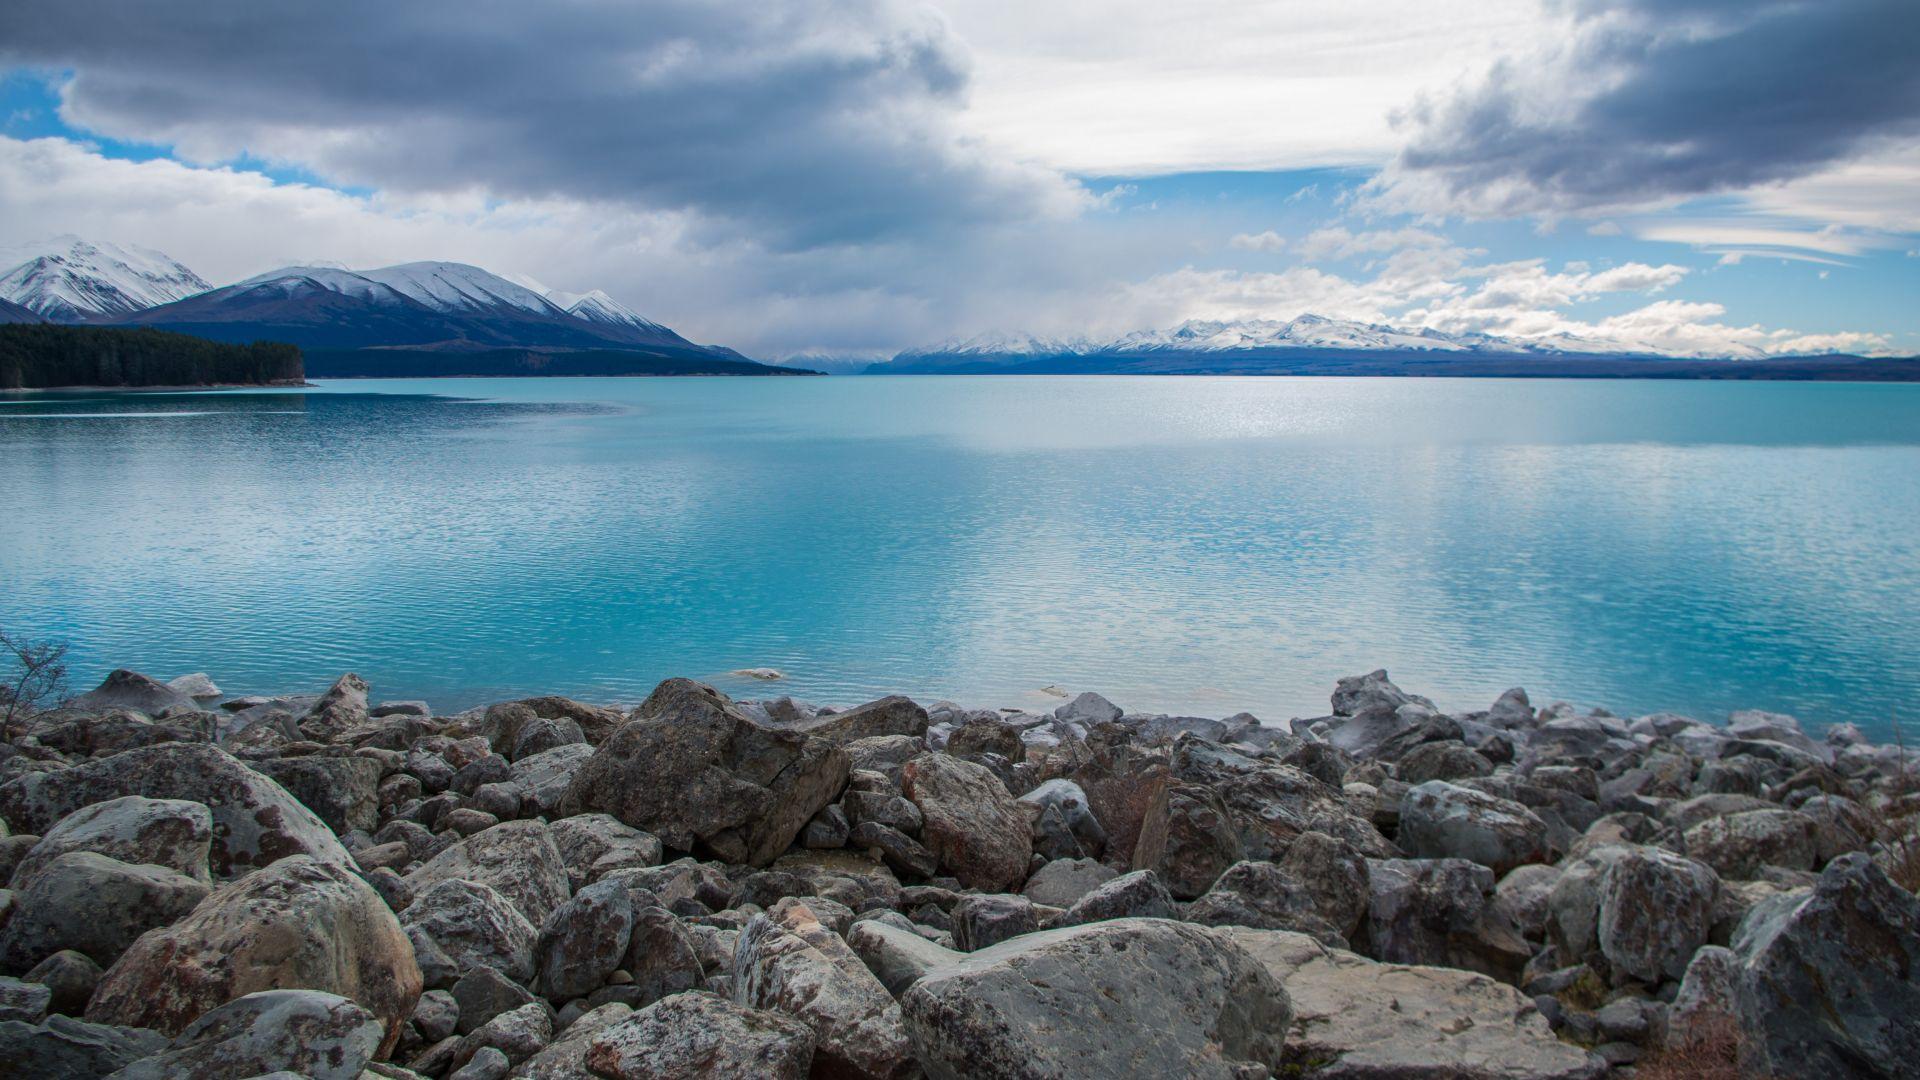 теракт новая зеландия Picture: Обои Новая Зеландия, озеро Пукаки, Lake Pukaki, New